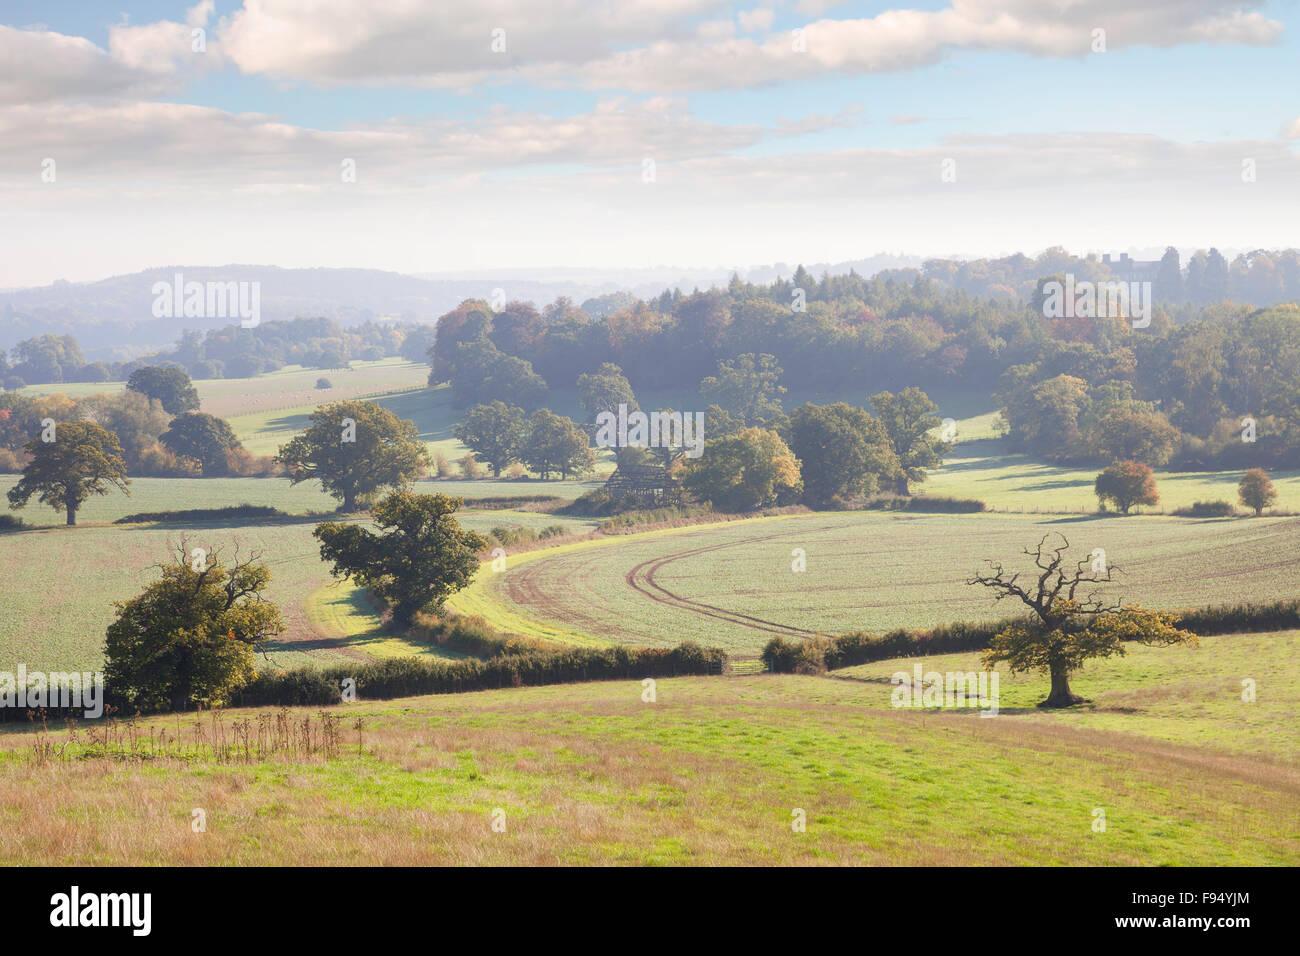 View over Ragley Estate, Warwickshire, England. Stock Photo